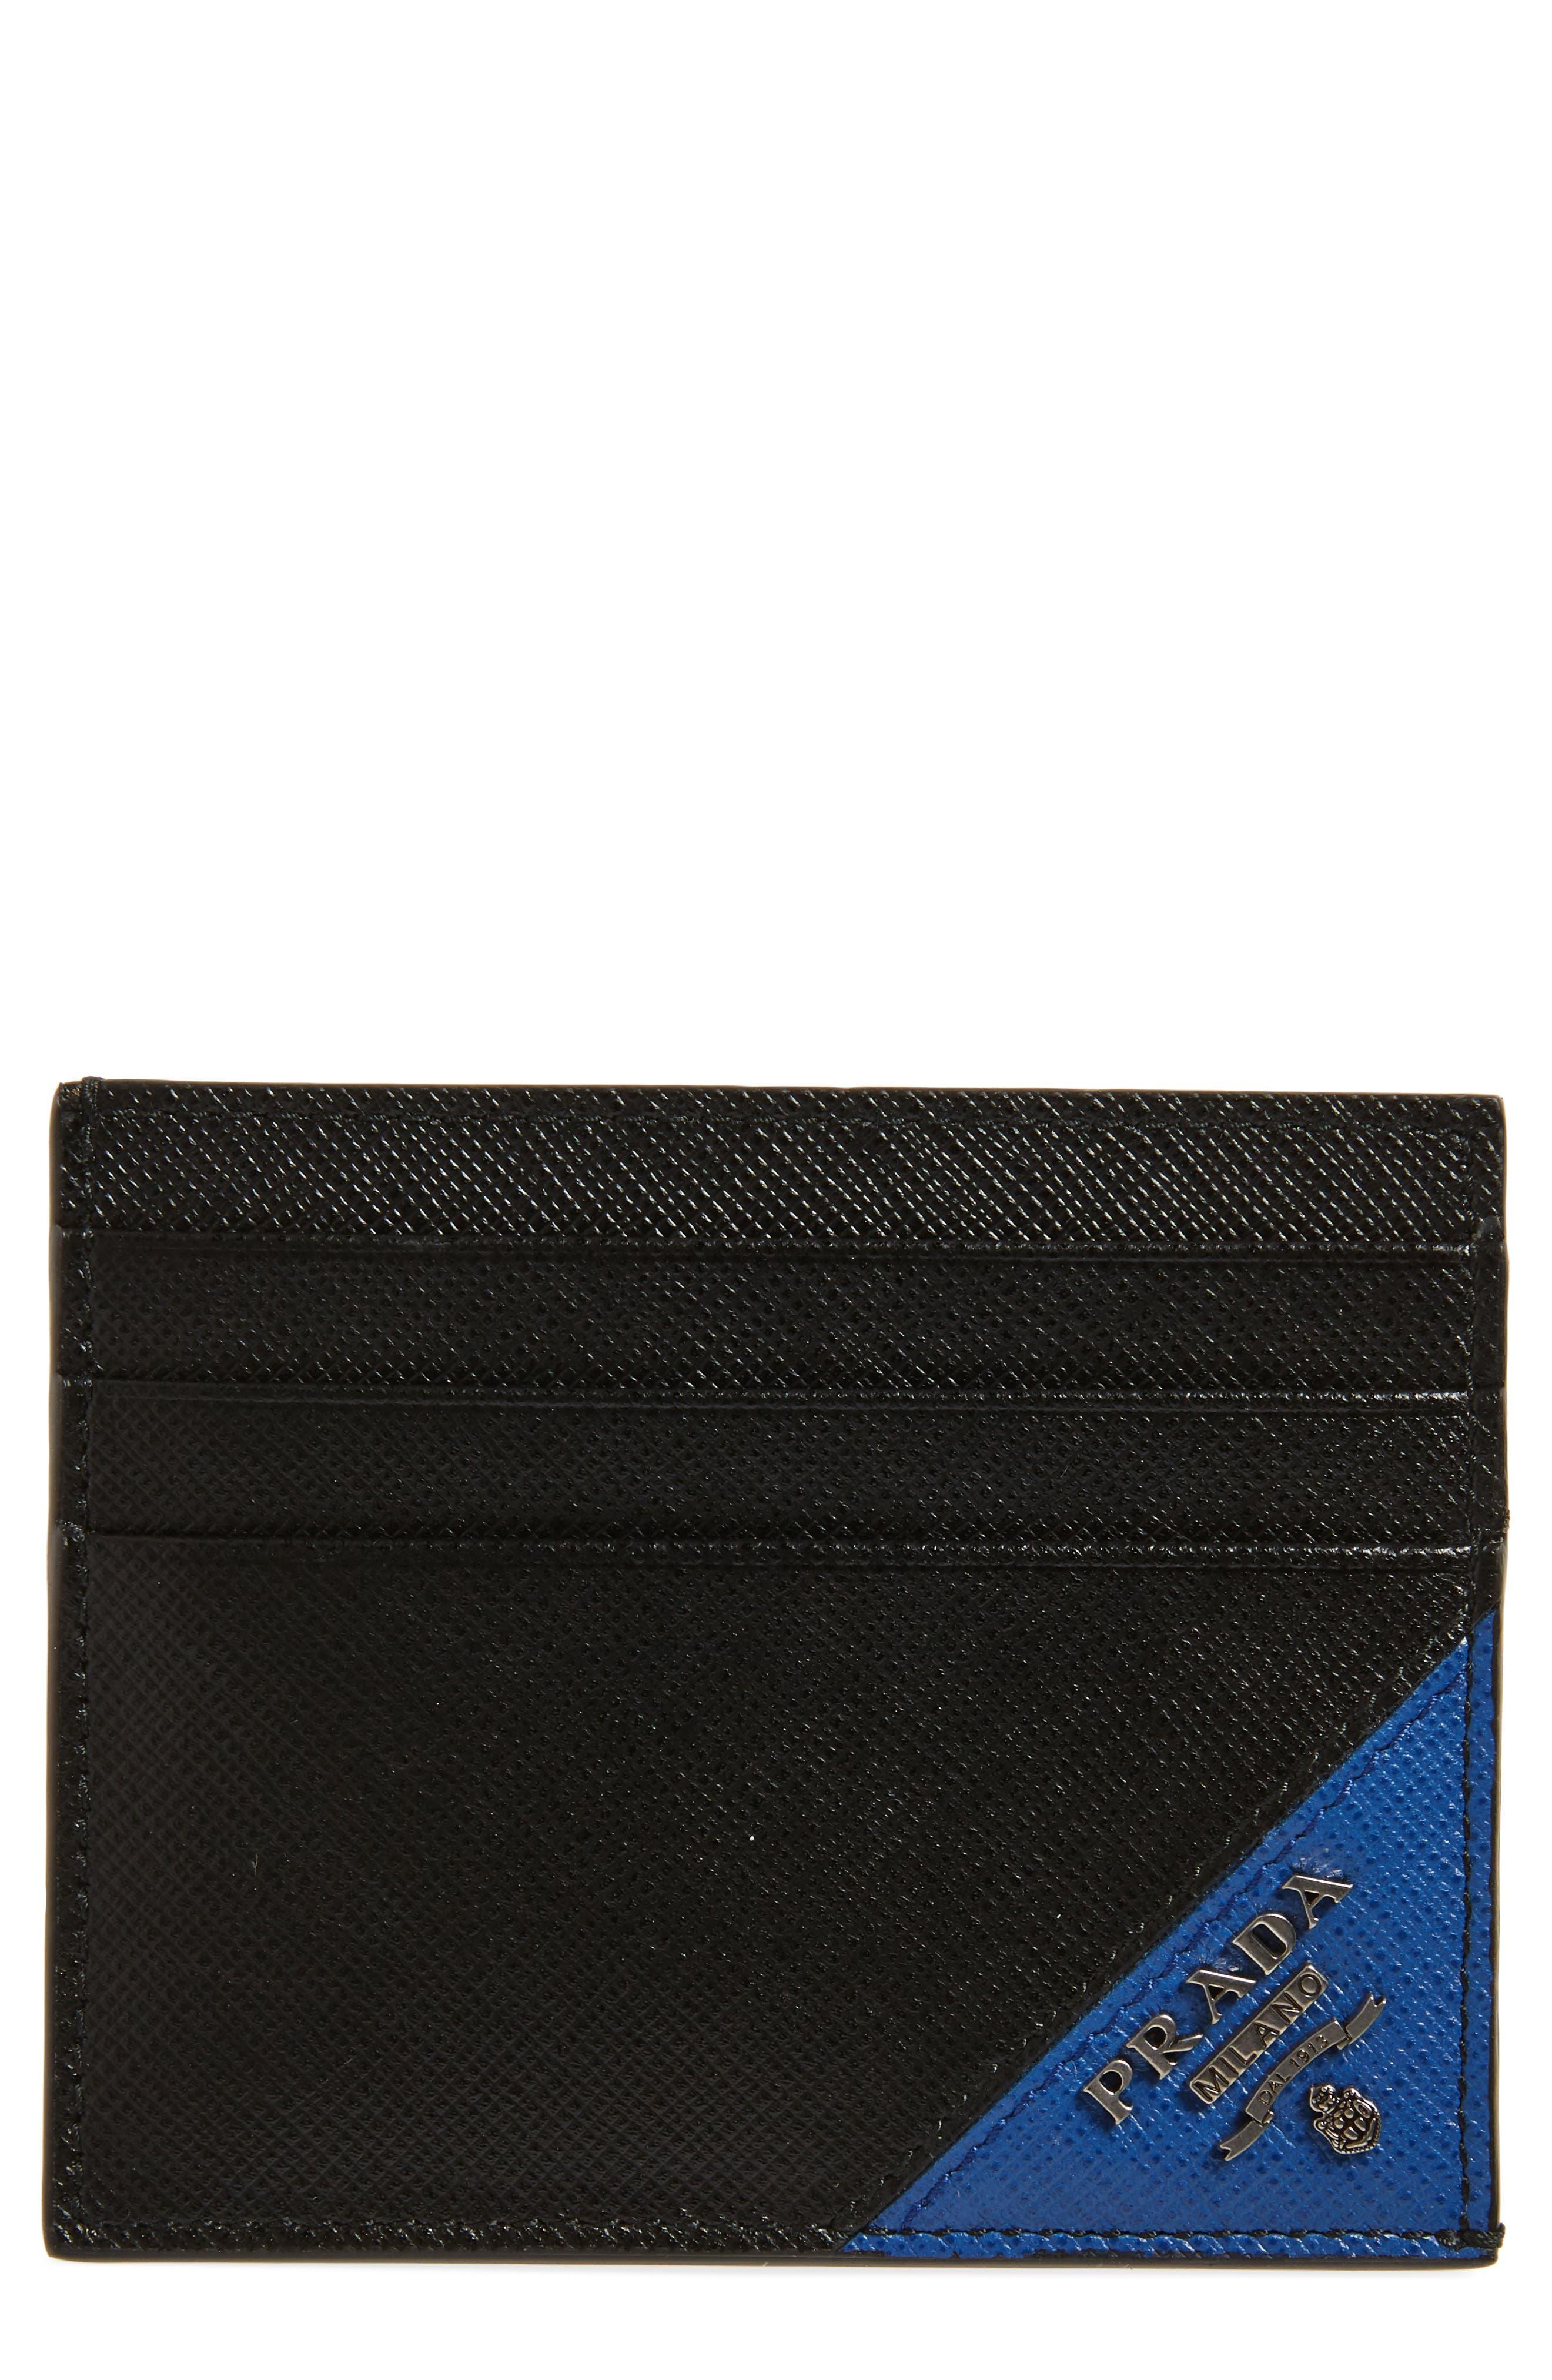 Alternate Image 1 Selected - Prada Saffiano Leather Card Case